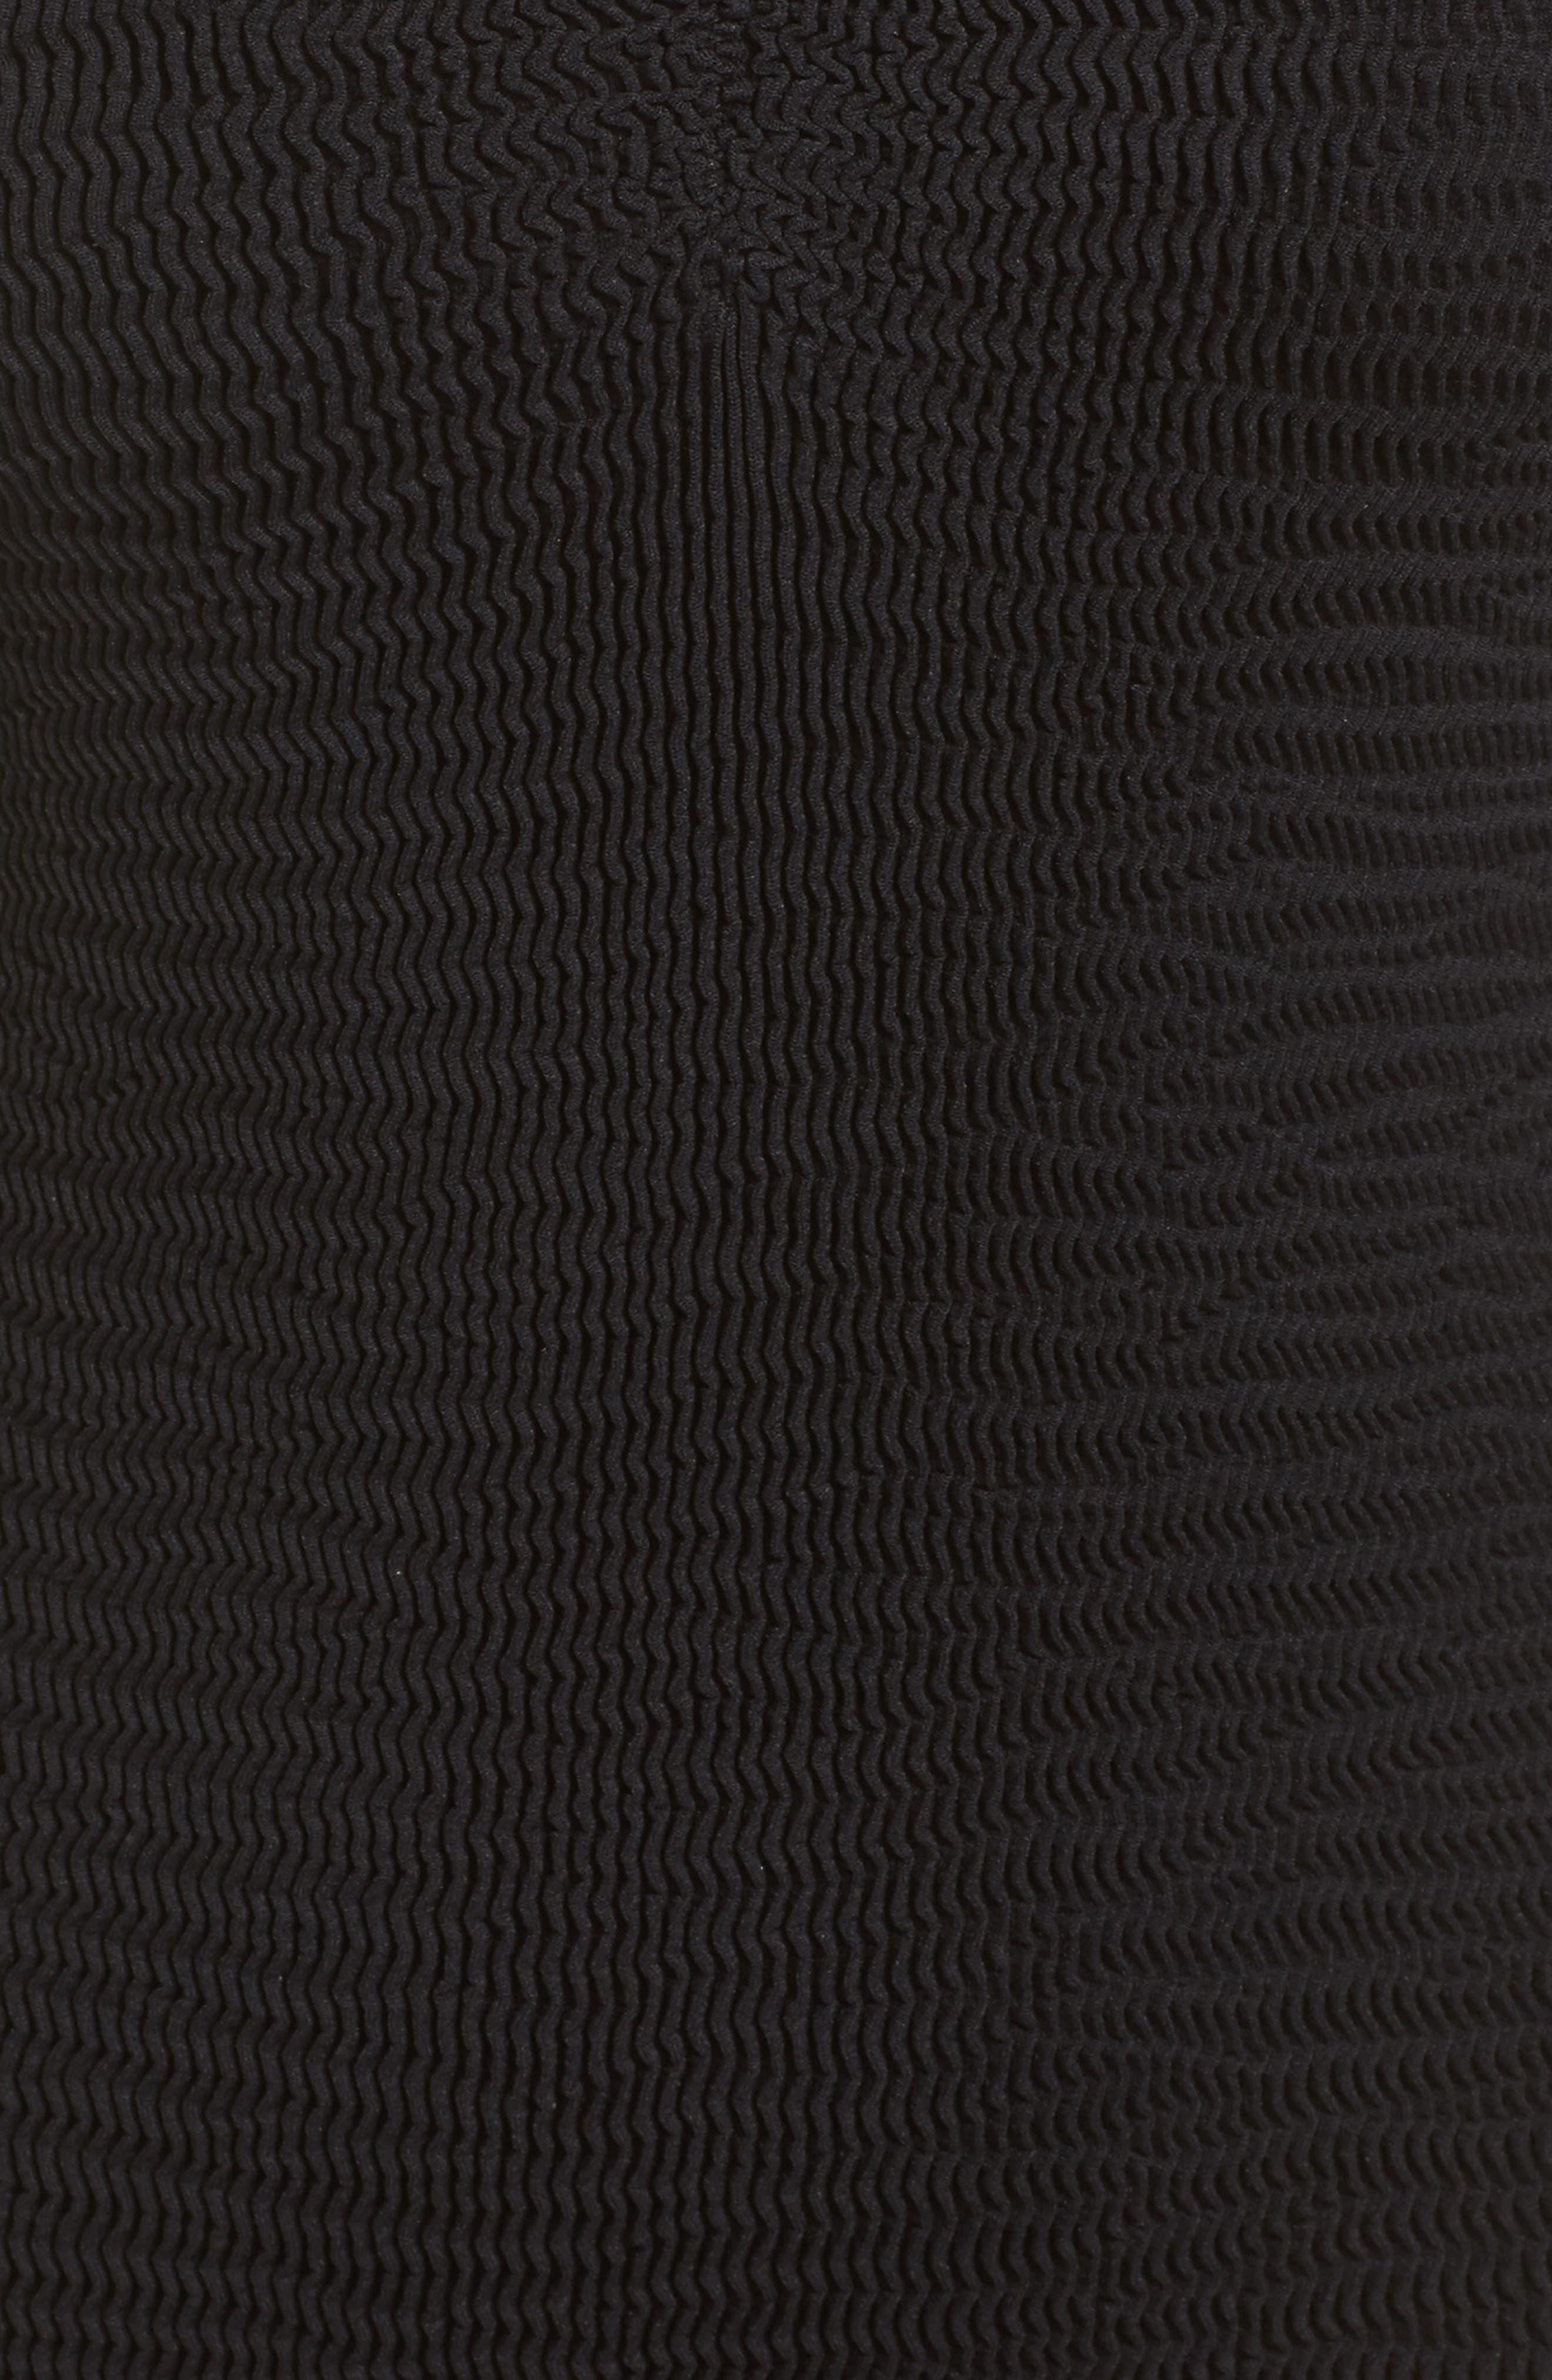 Tubular One-Piece Swimsuit,                             Alternate thumbnail 5, color,                             Black